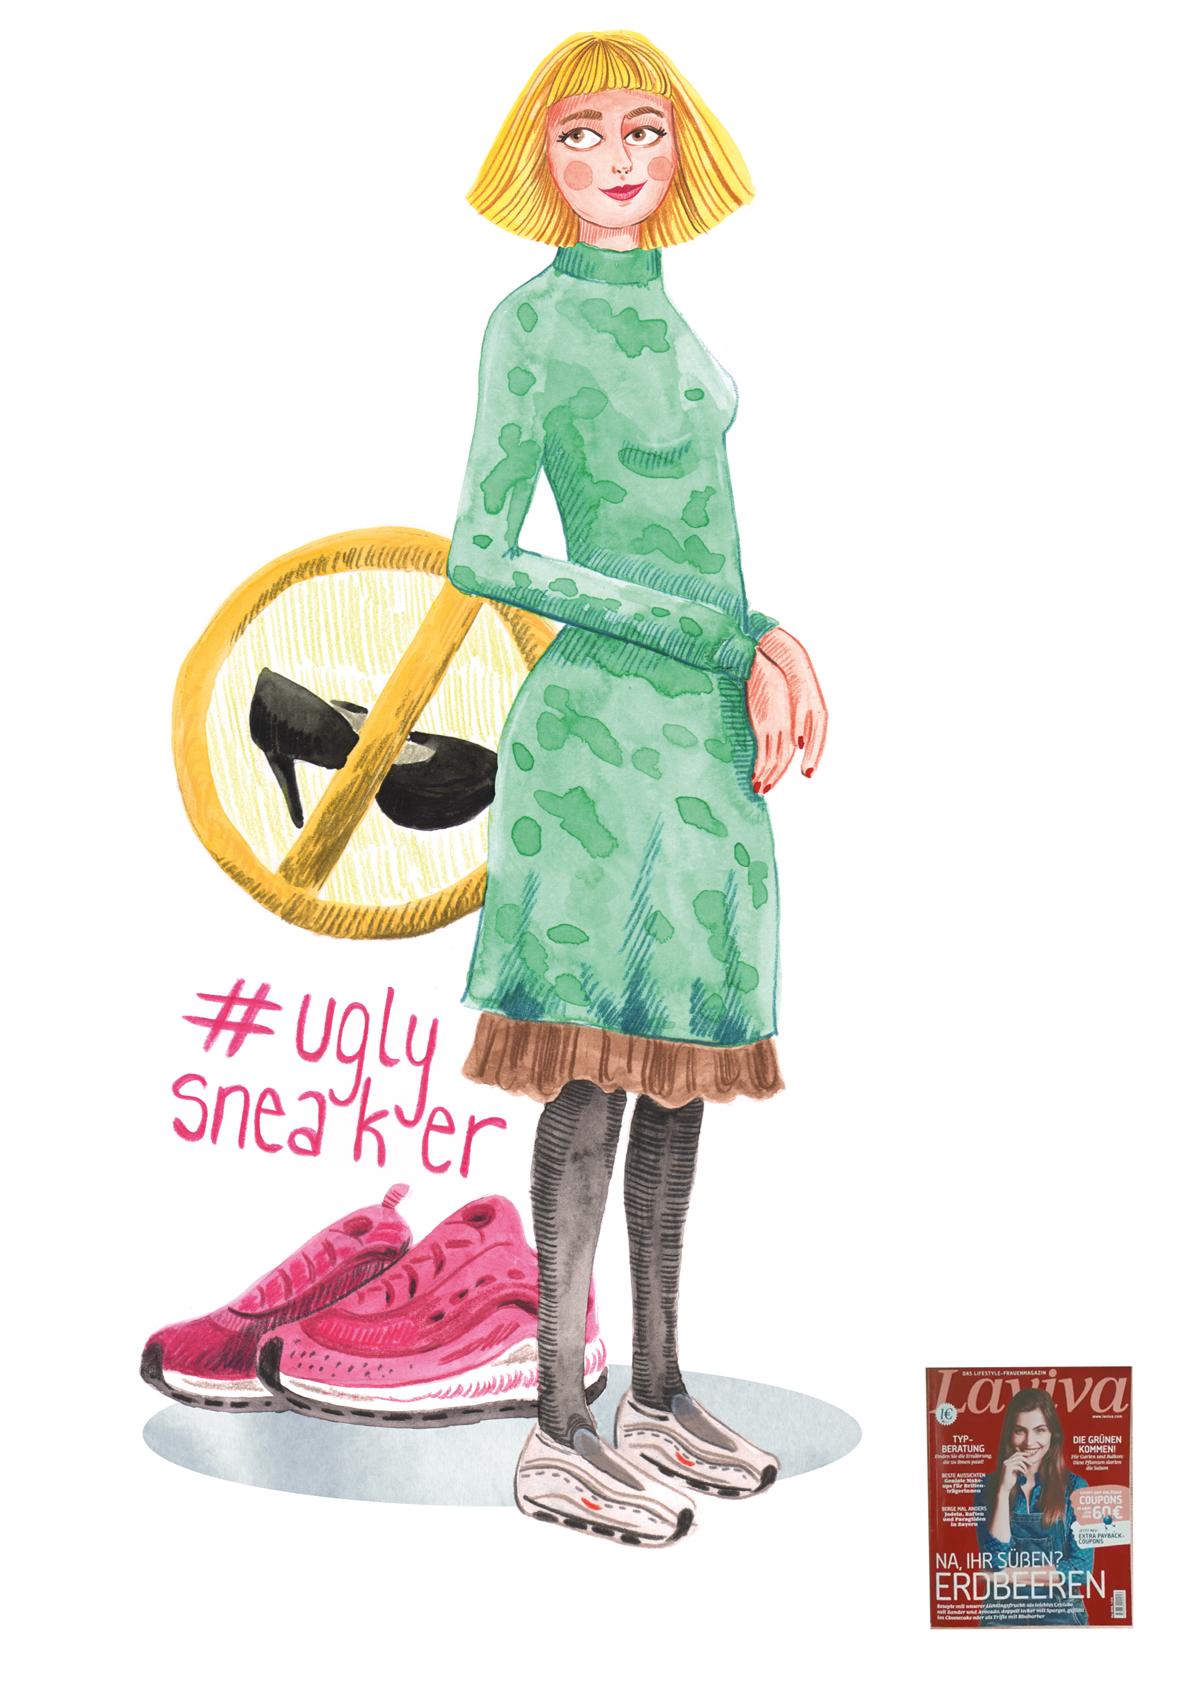 AnneQuadflieg_illustration_Laviva_Sneaker_web1.jpg